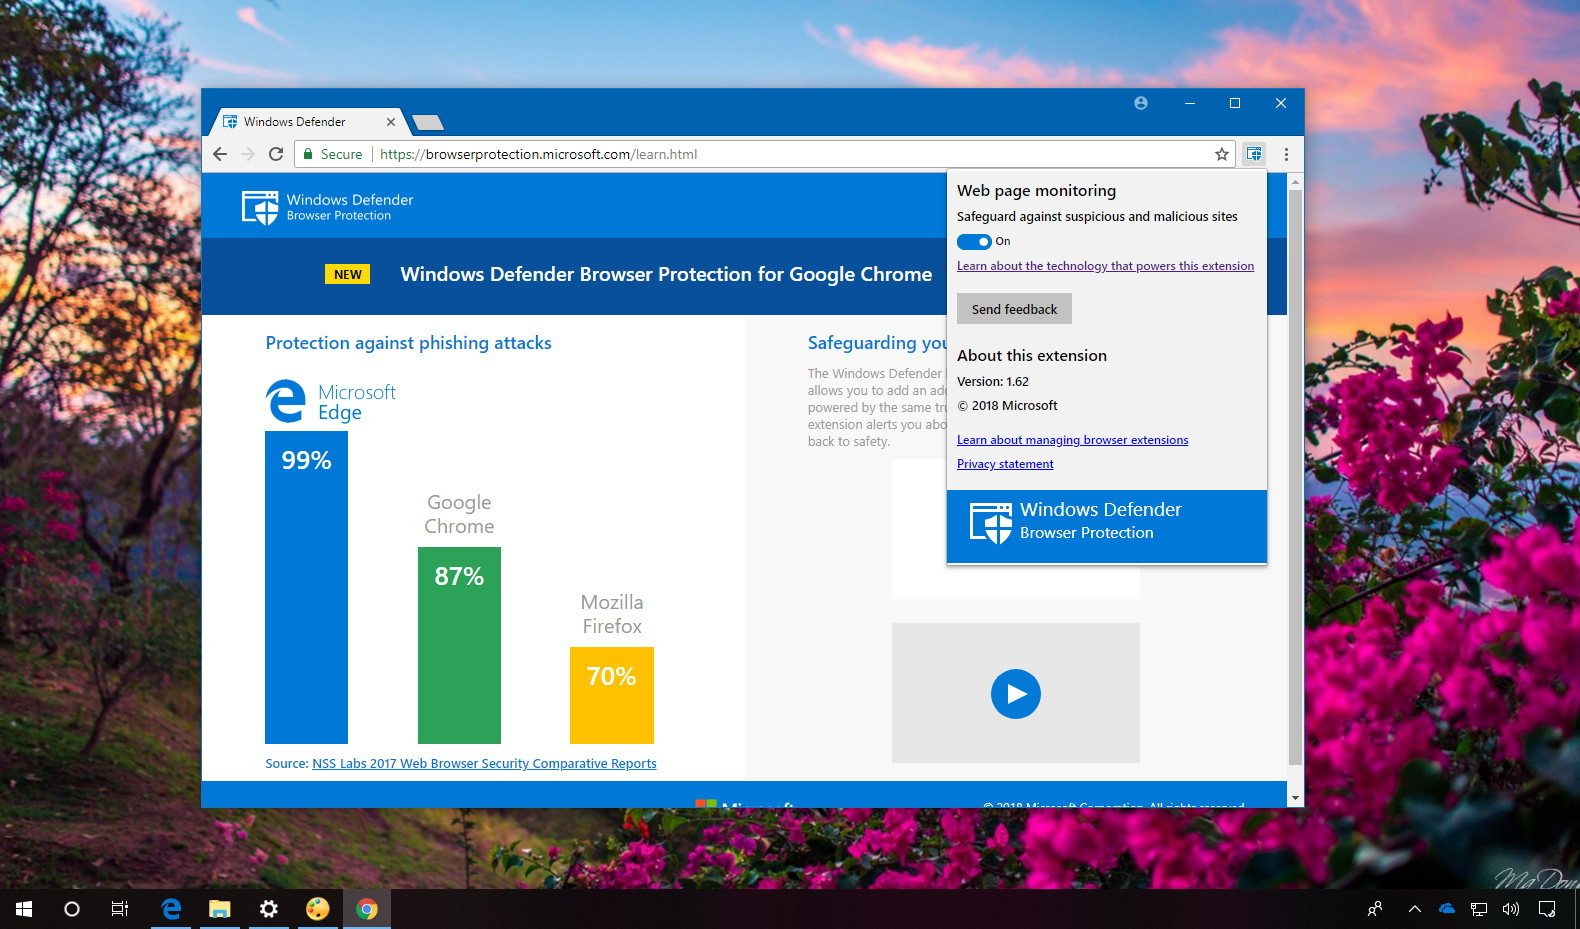 Windows Defender Chrome extension